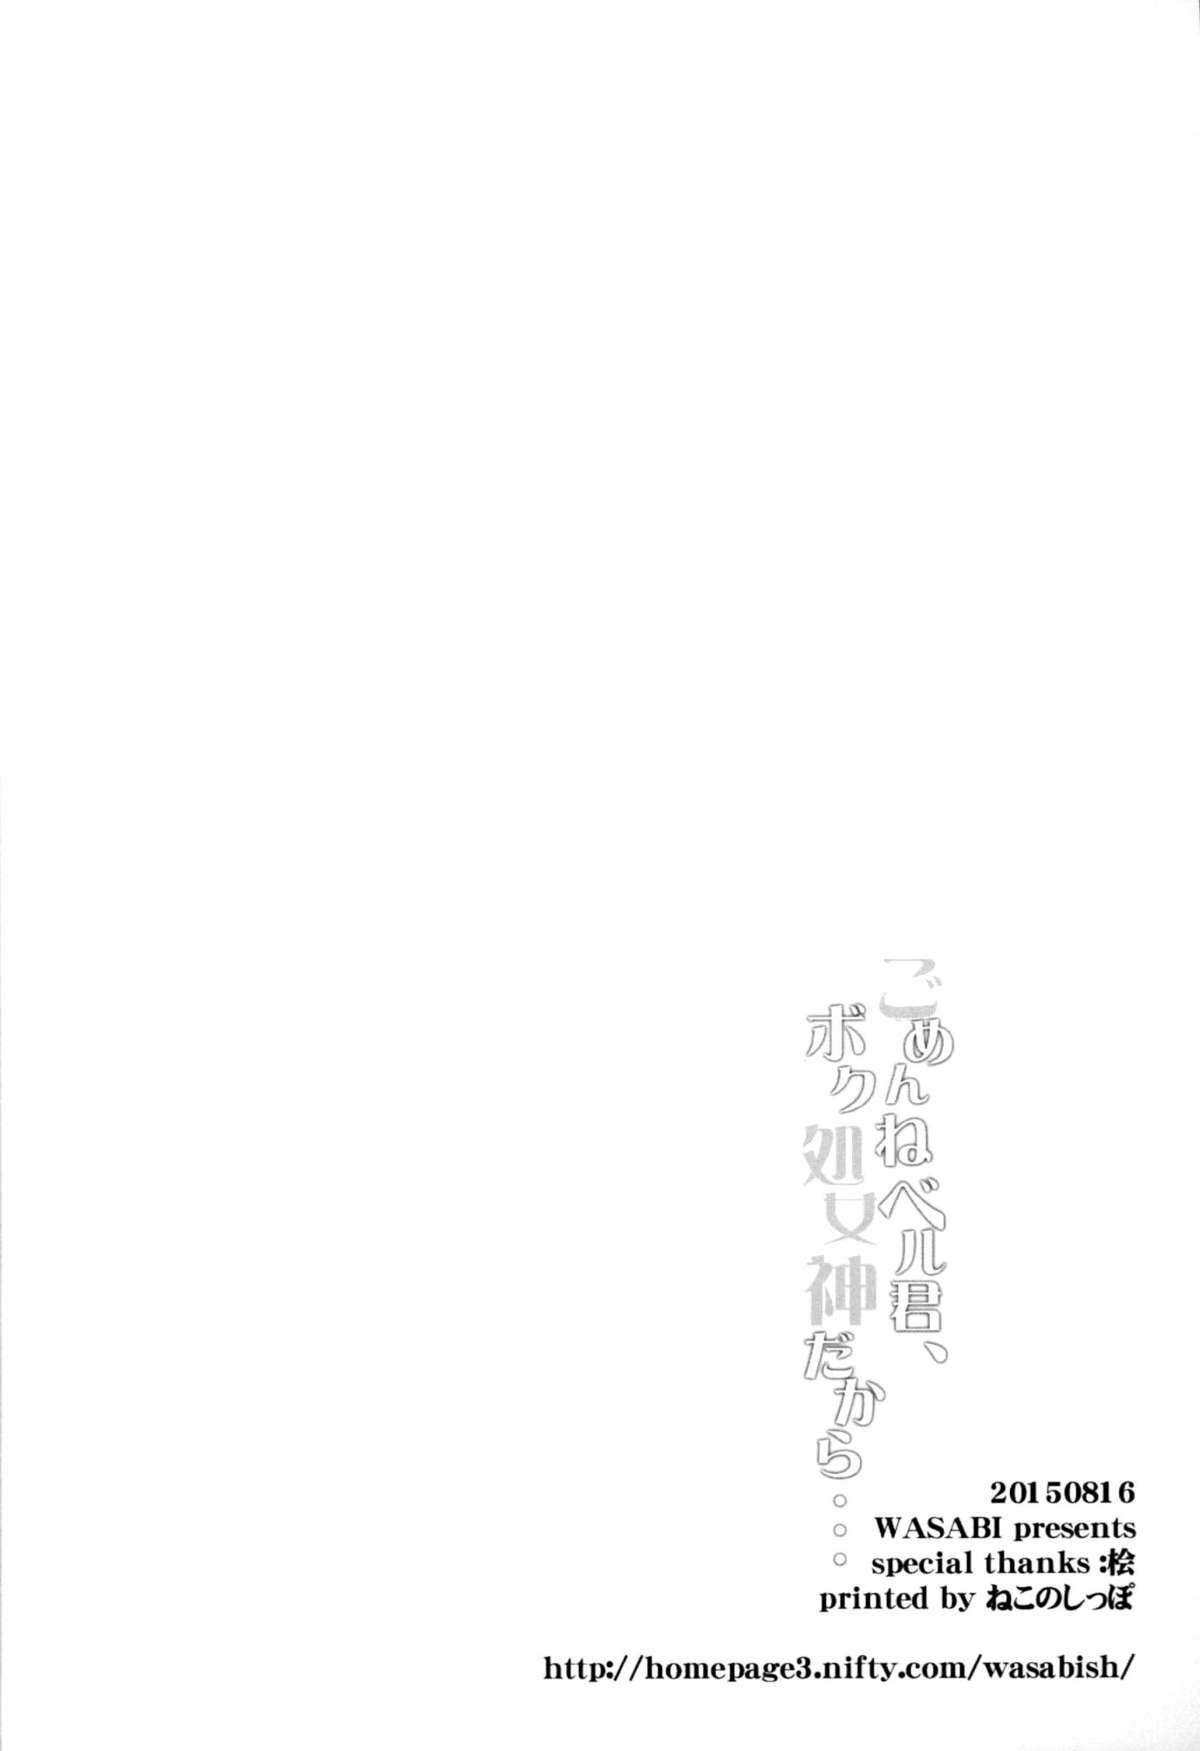 Gomenne Bell-kun, Boku Shojoshin Dakara... 15